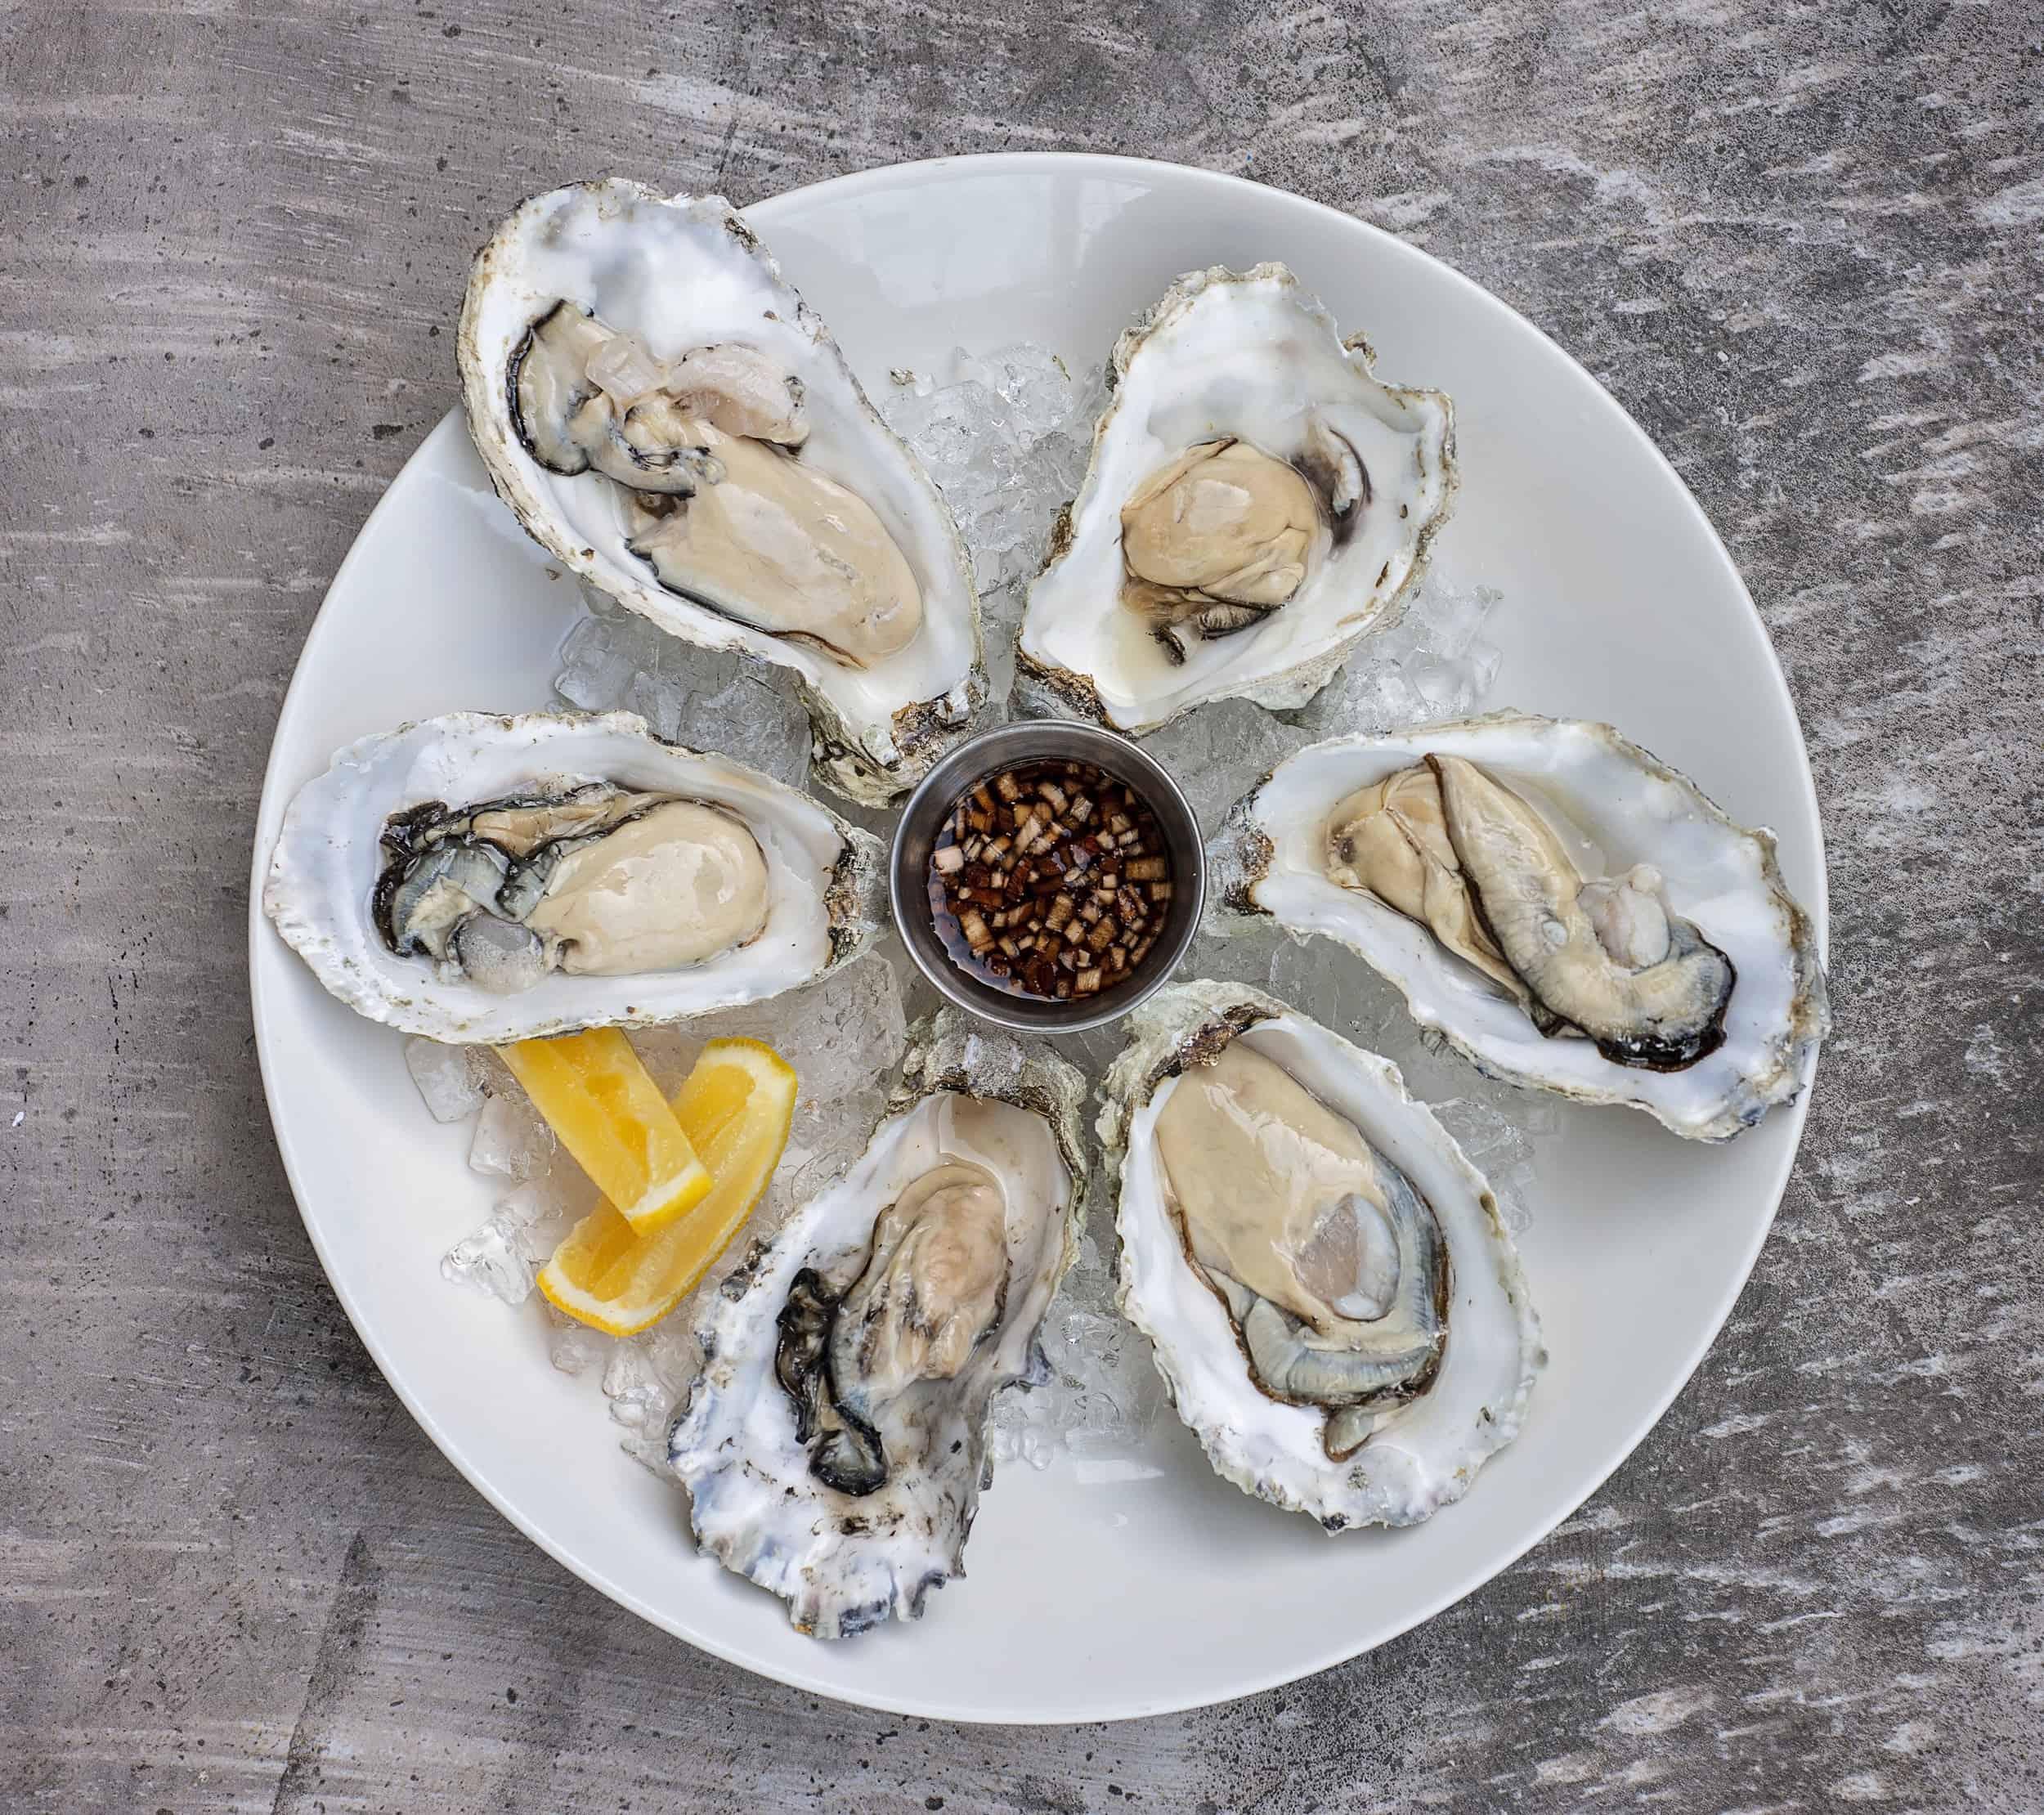 Qualicum Beach Cafe Oysters